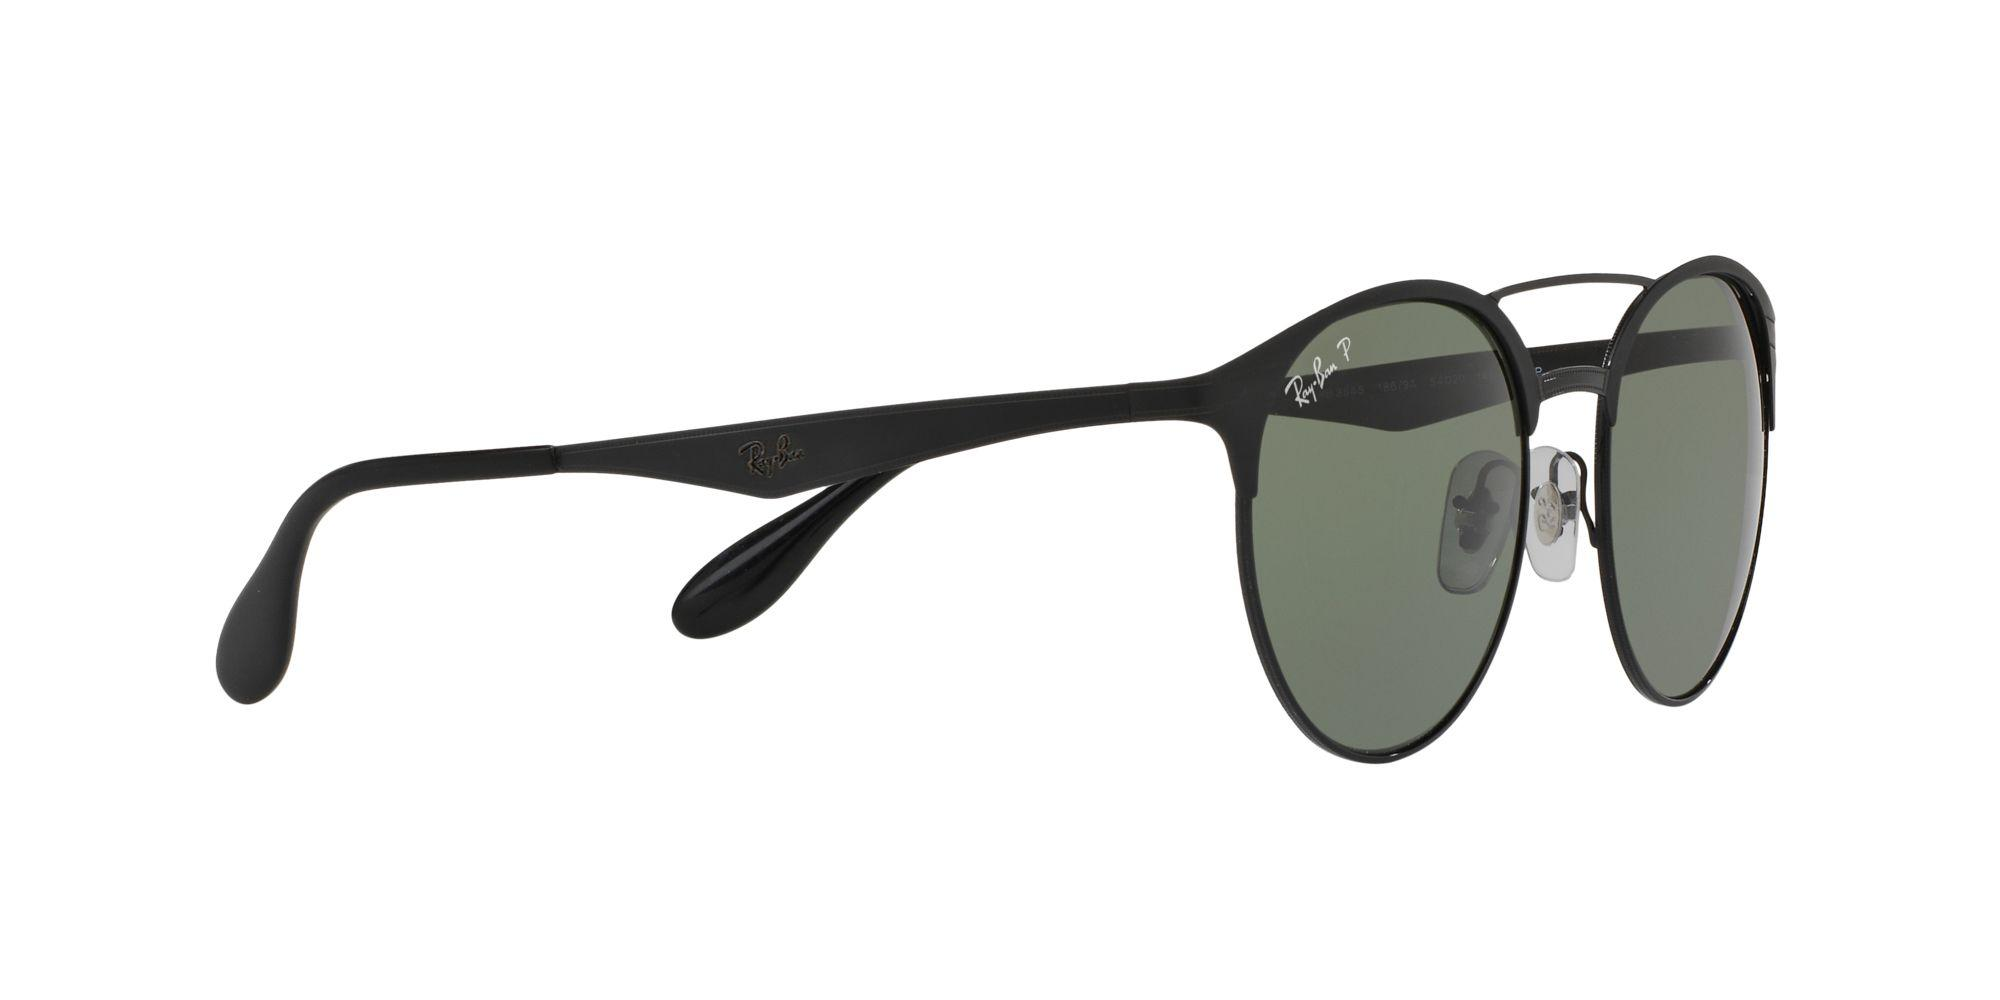 Ray-Ban Matte Phantos Rb3545 Sunglasses in Black for Men